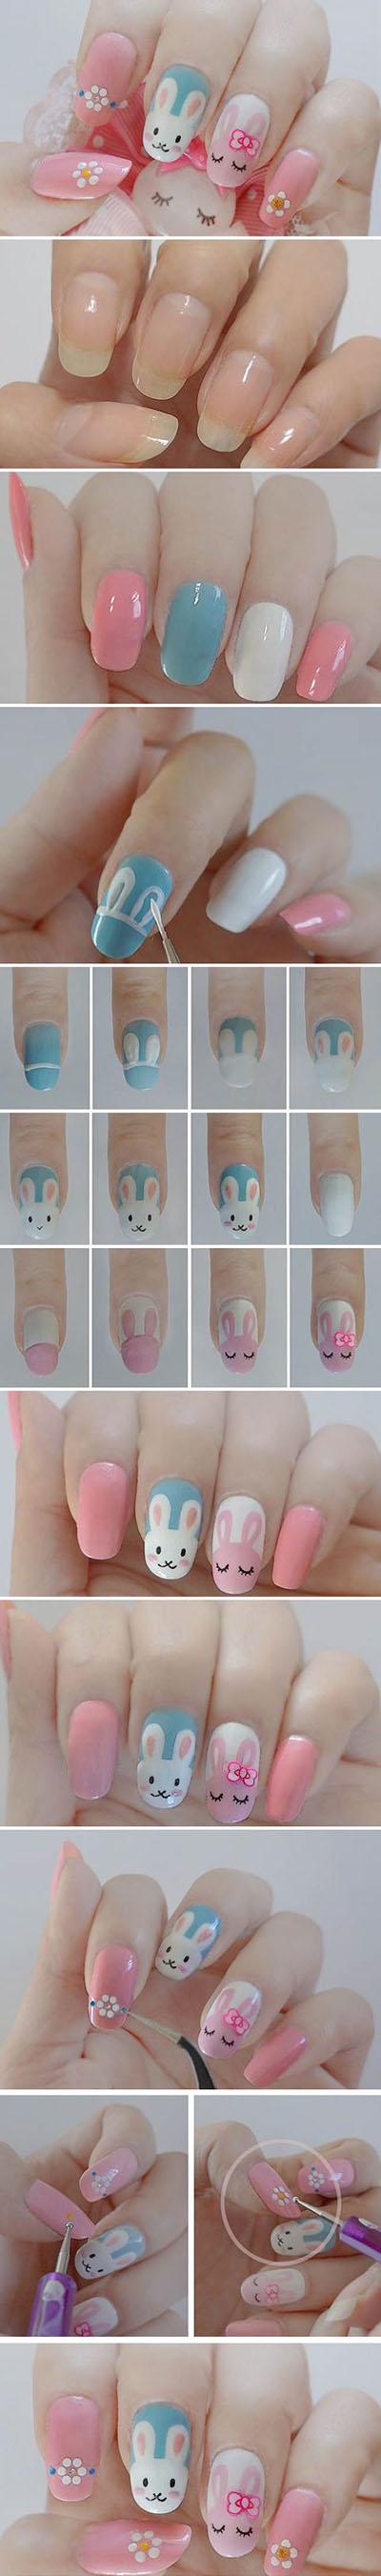 20 DIY Cute Rabbit Nail Design easter 9f4bb